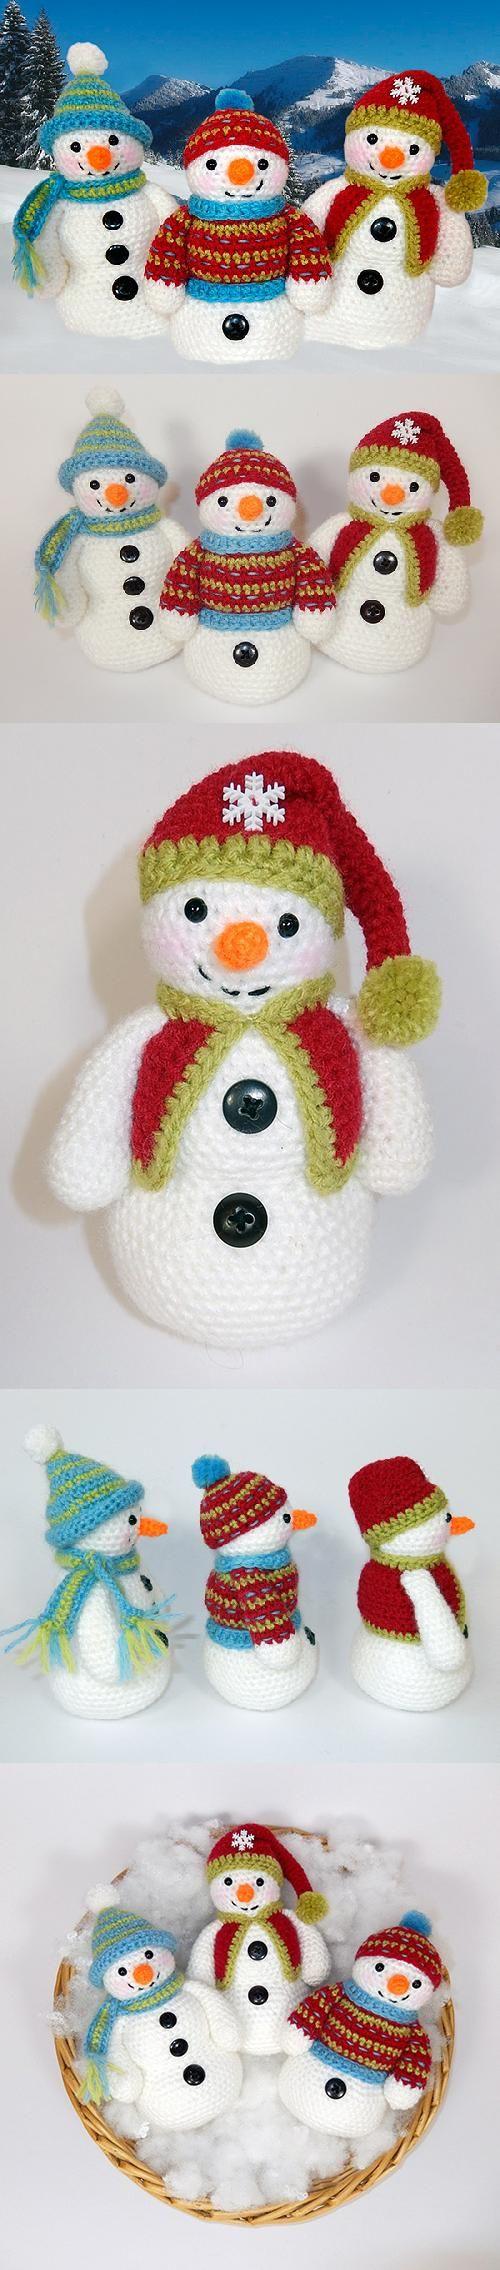 http://www.amigurumipatterns.net/shop/Moji-Moji-Design/Frosty-Freezy-and-Fred/